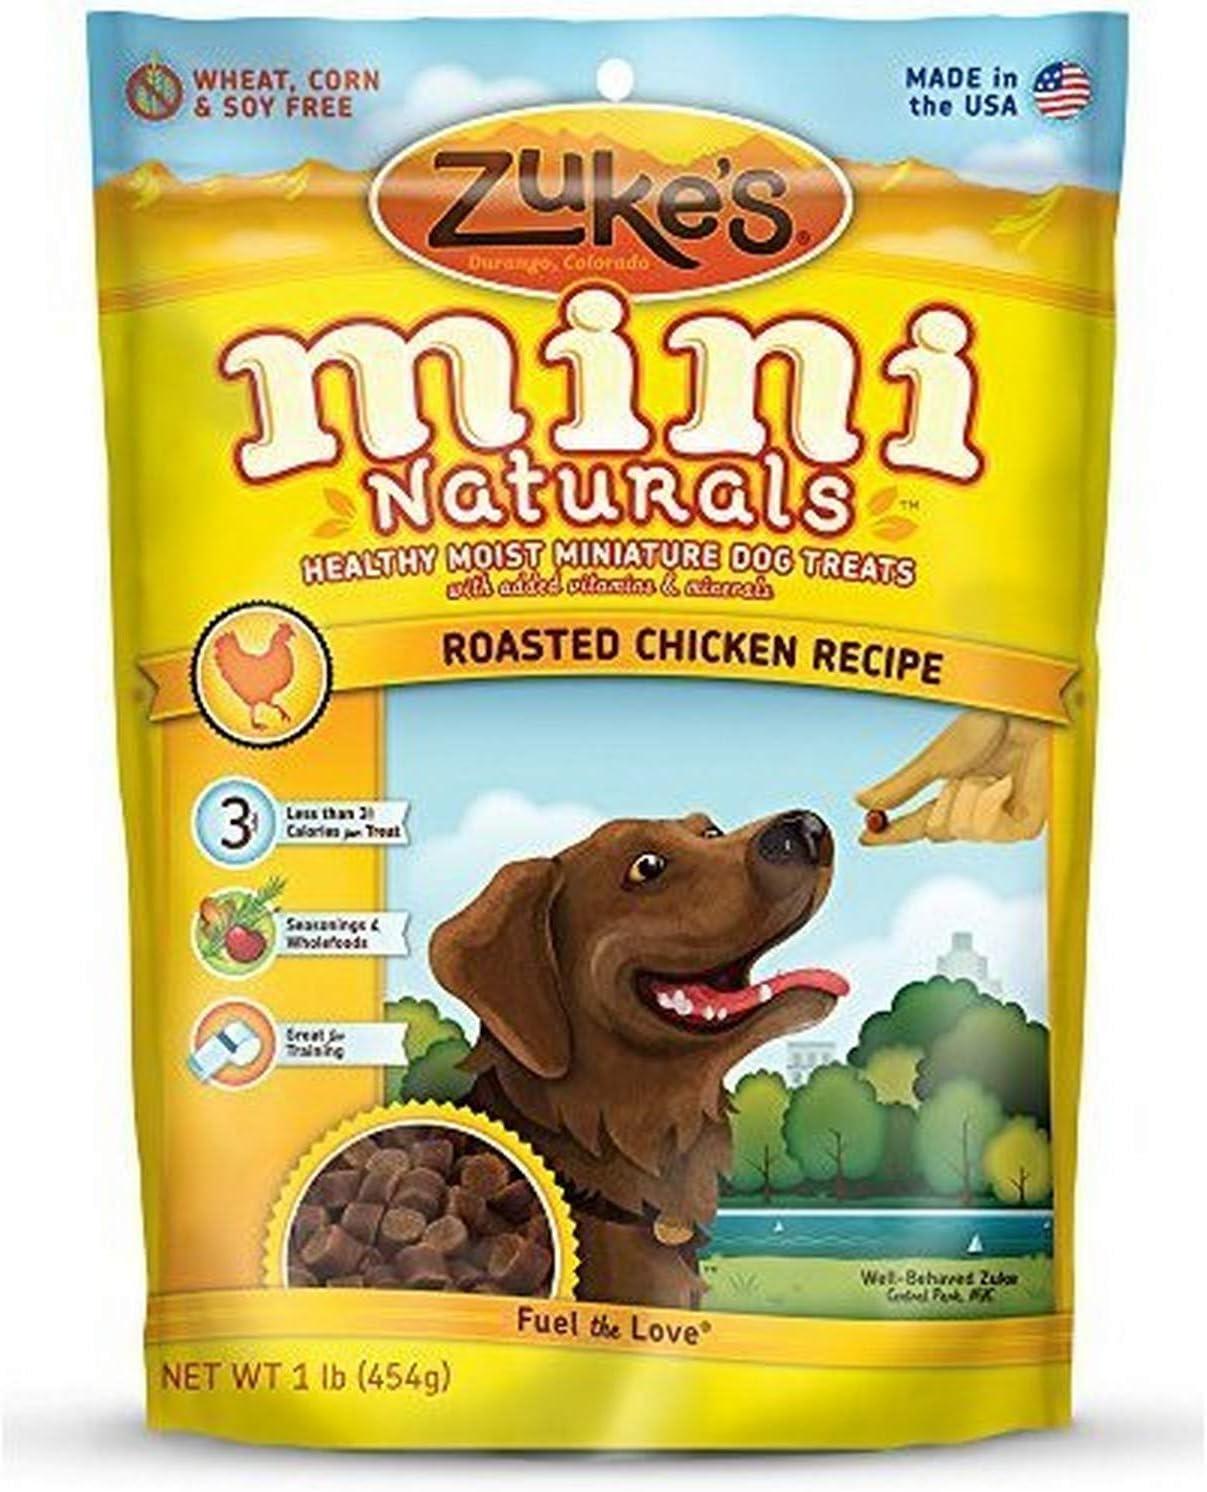 Zukes, Mini Naturals, Grain Free Dog Treats, Economy Variety 6-Pack ……(16 Oz Each Flavor)